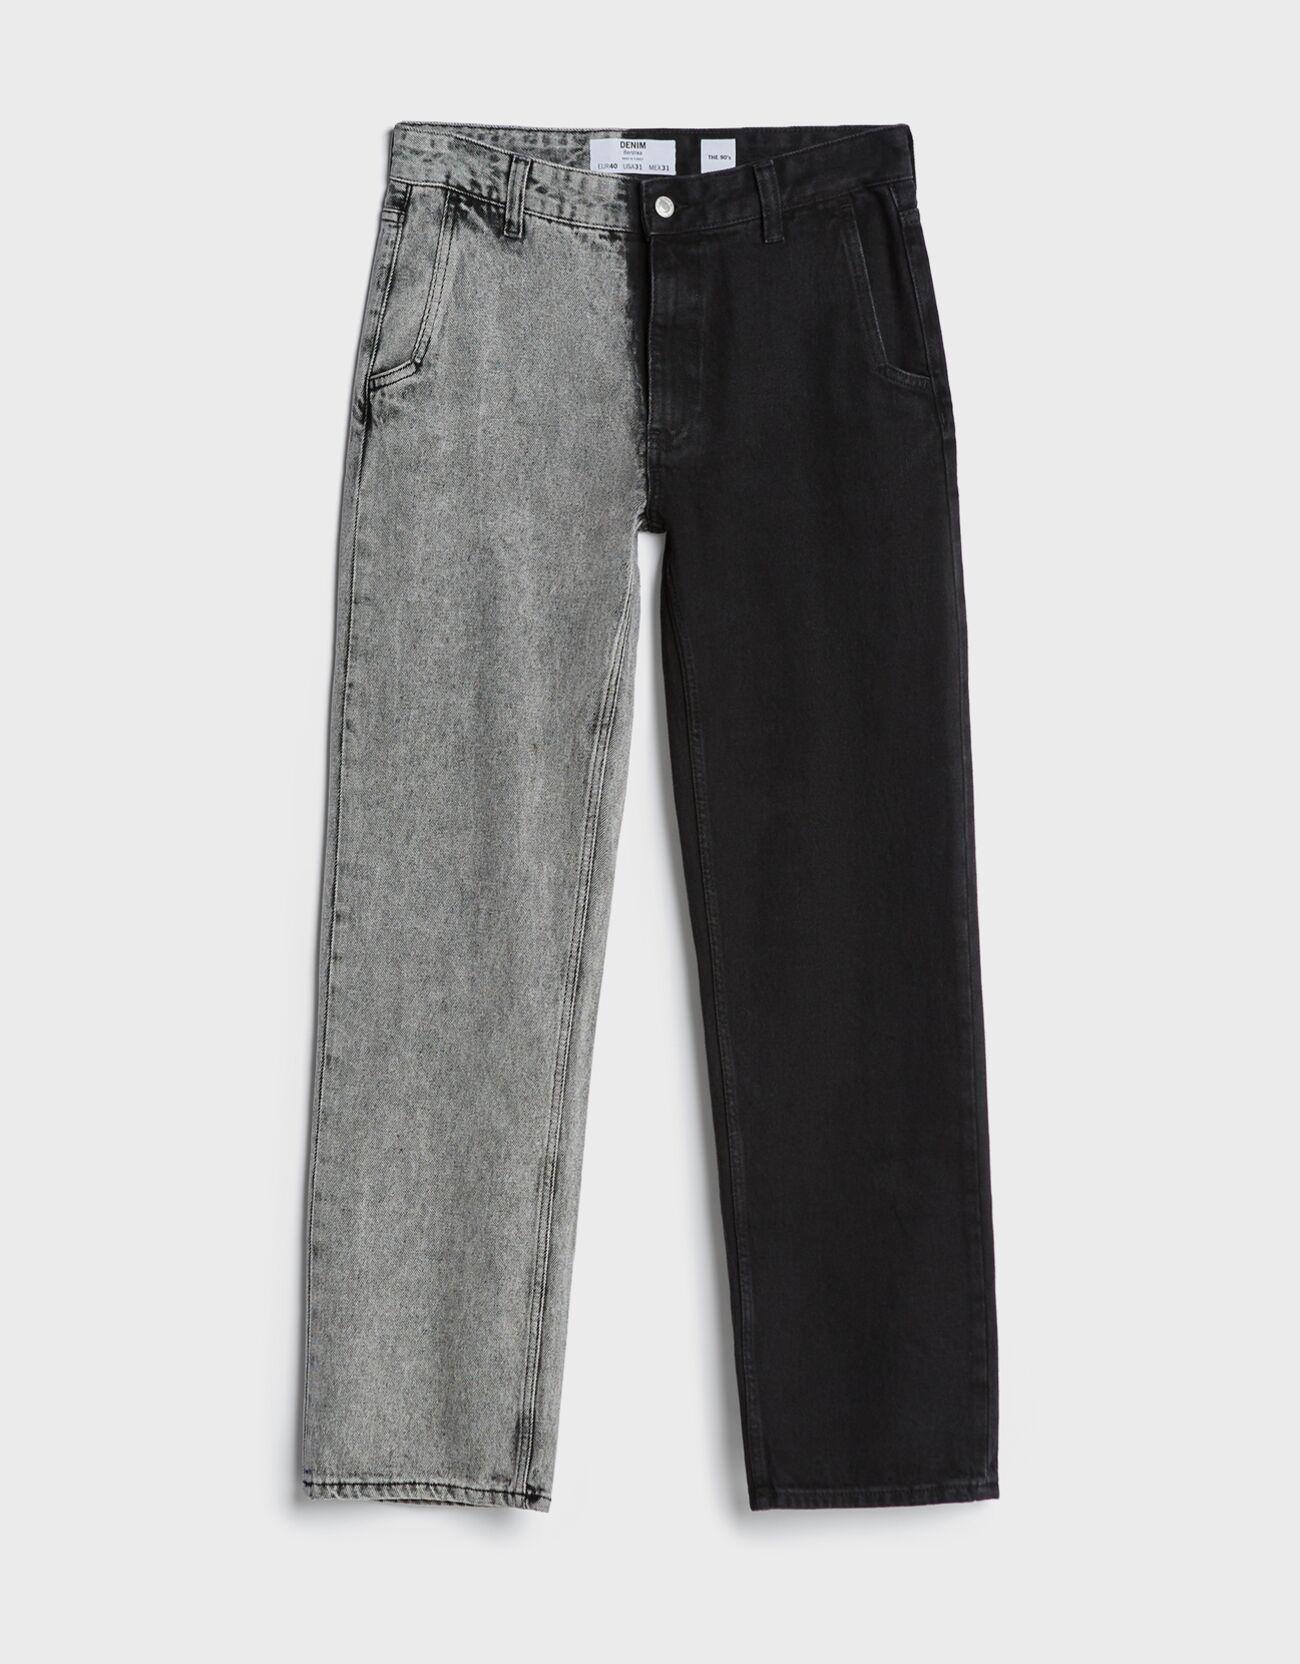 Jeans 90's contraste.